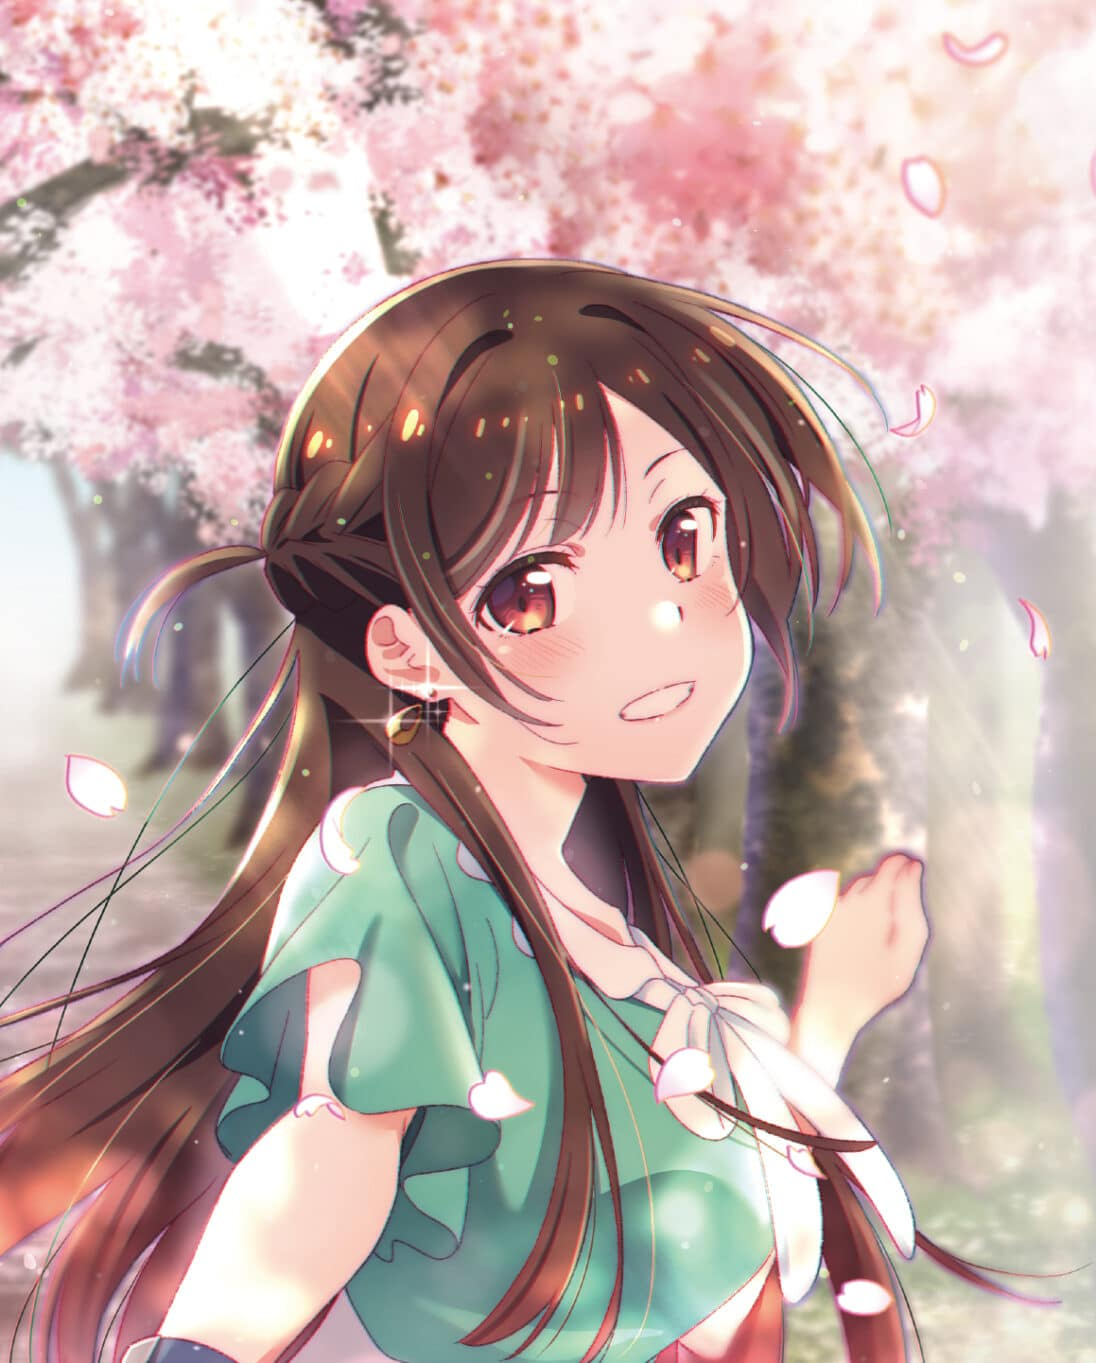 El anime Kanojo, Okarishimasu tendrá 12 episodios